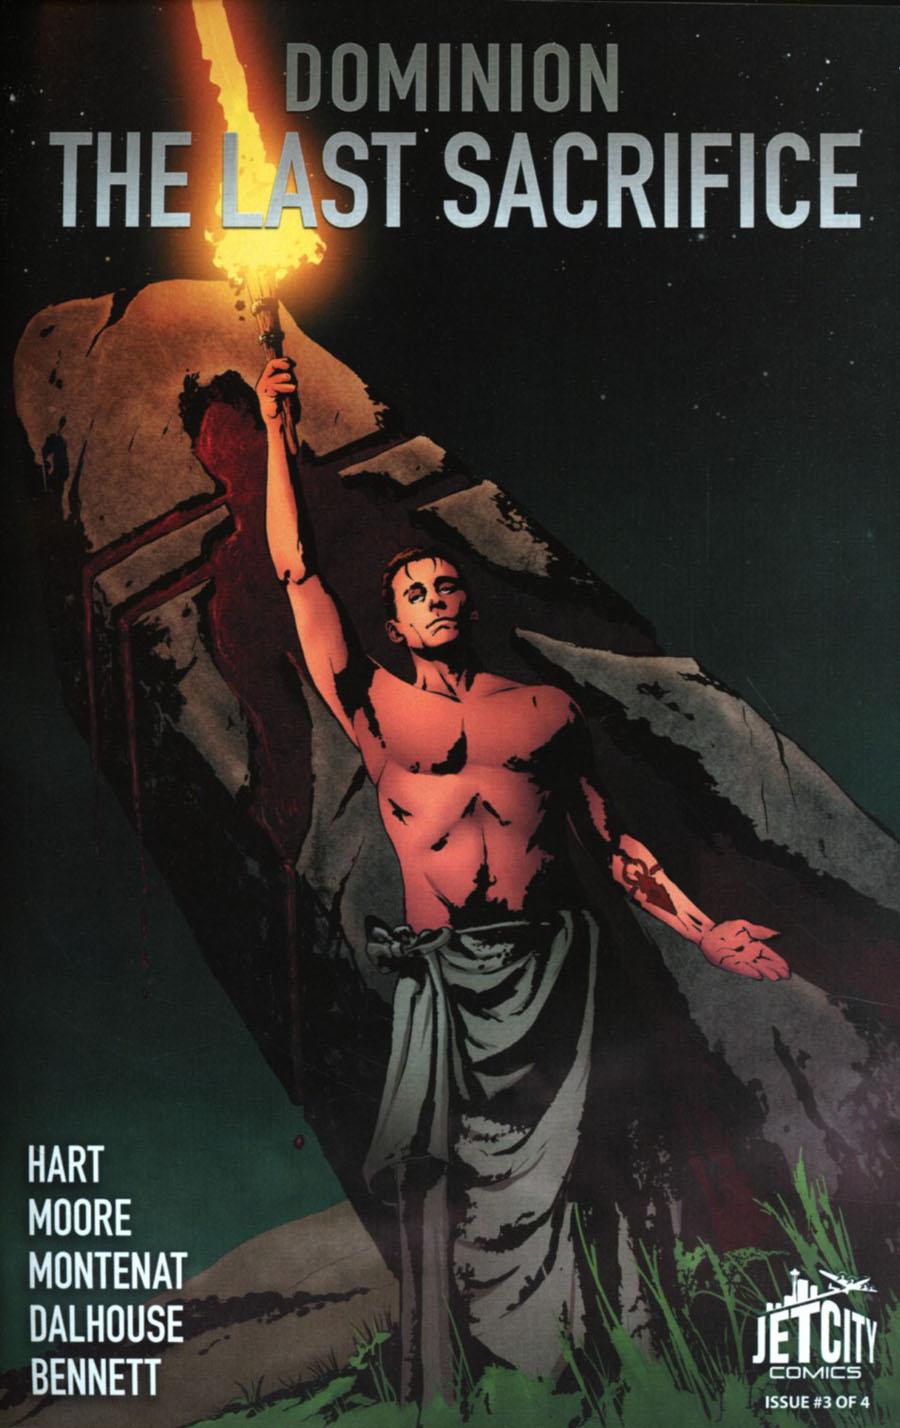 Dominion Last Sacrifice #3